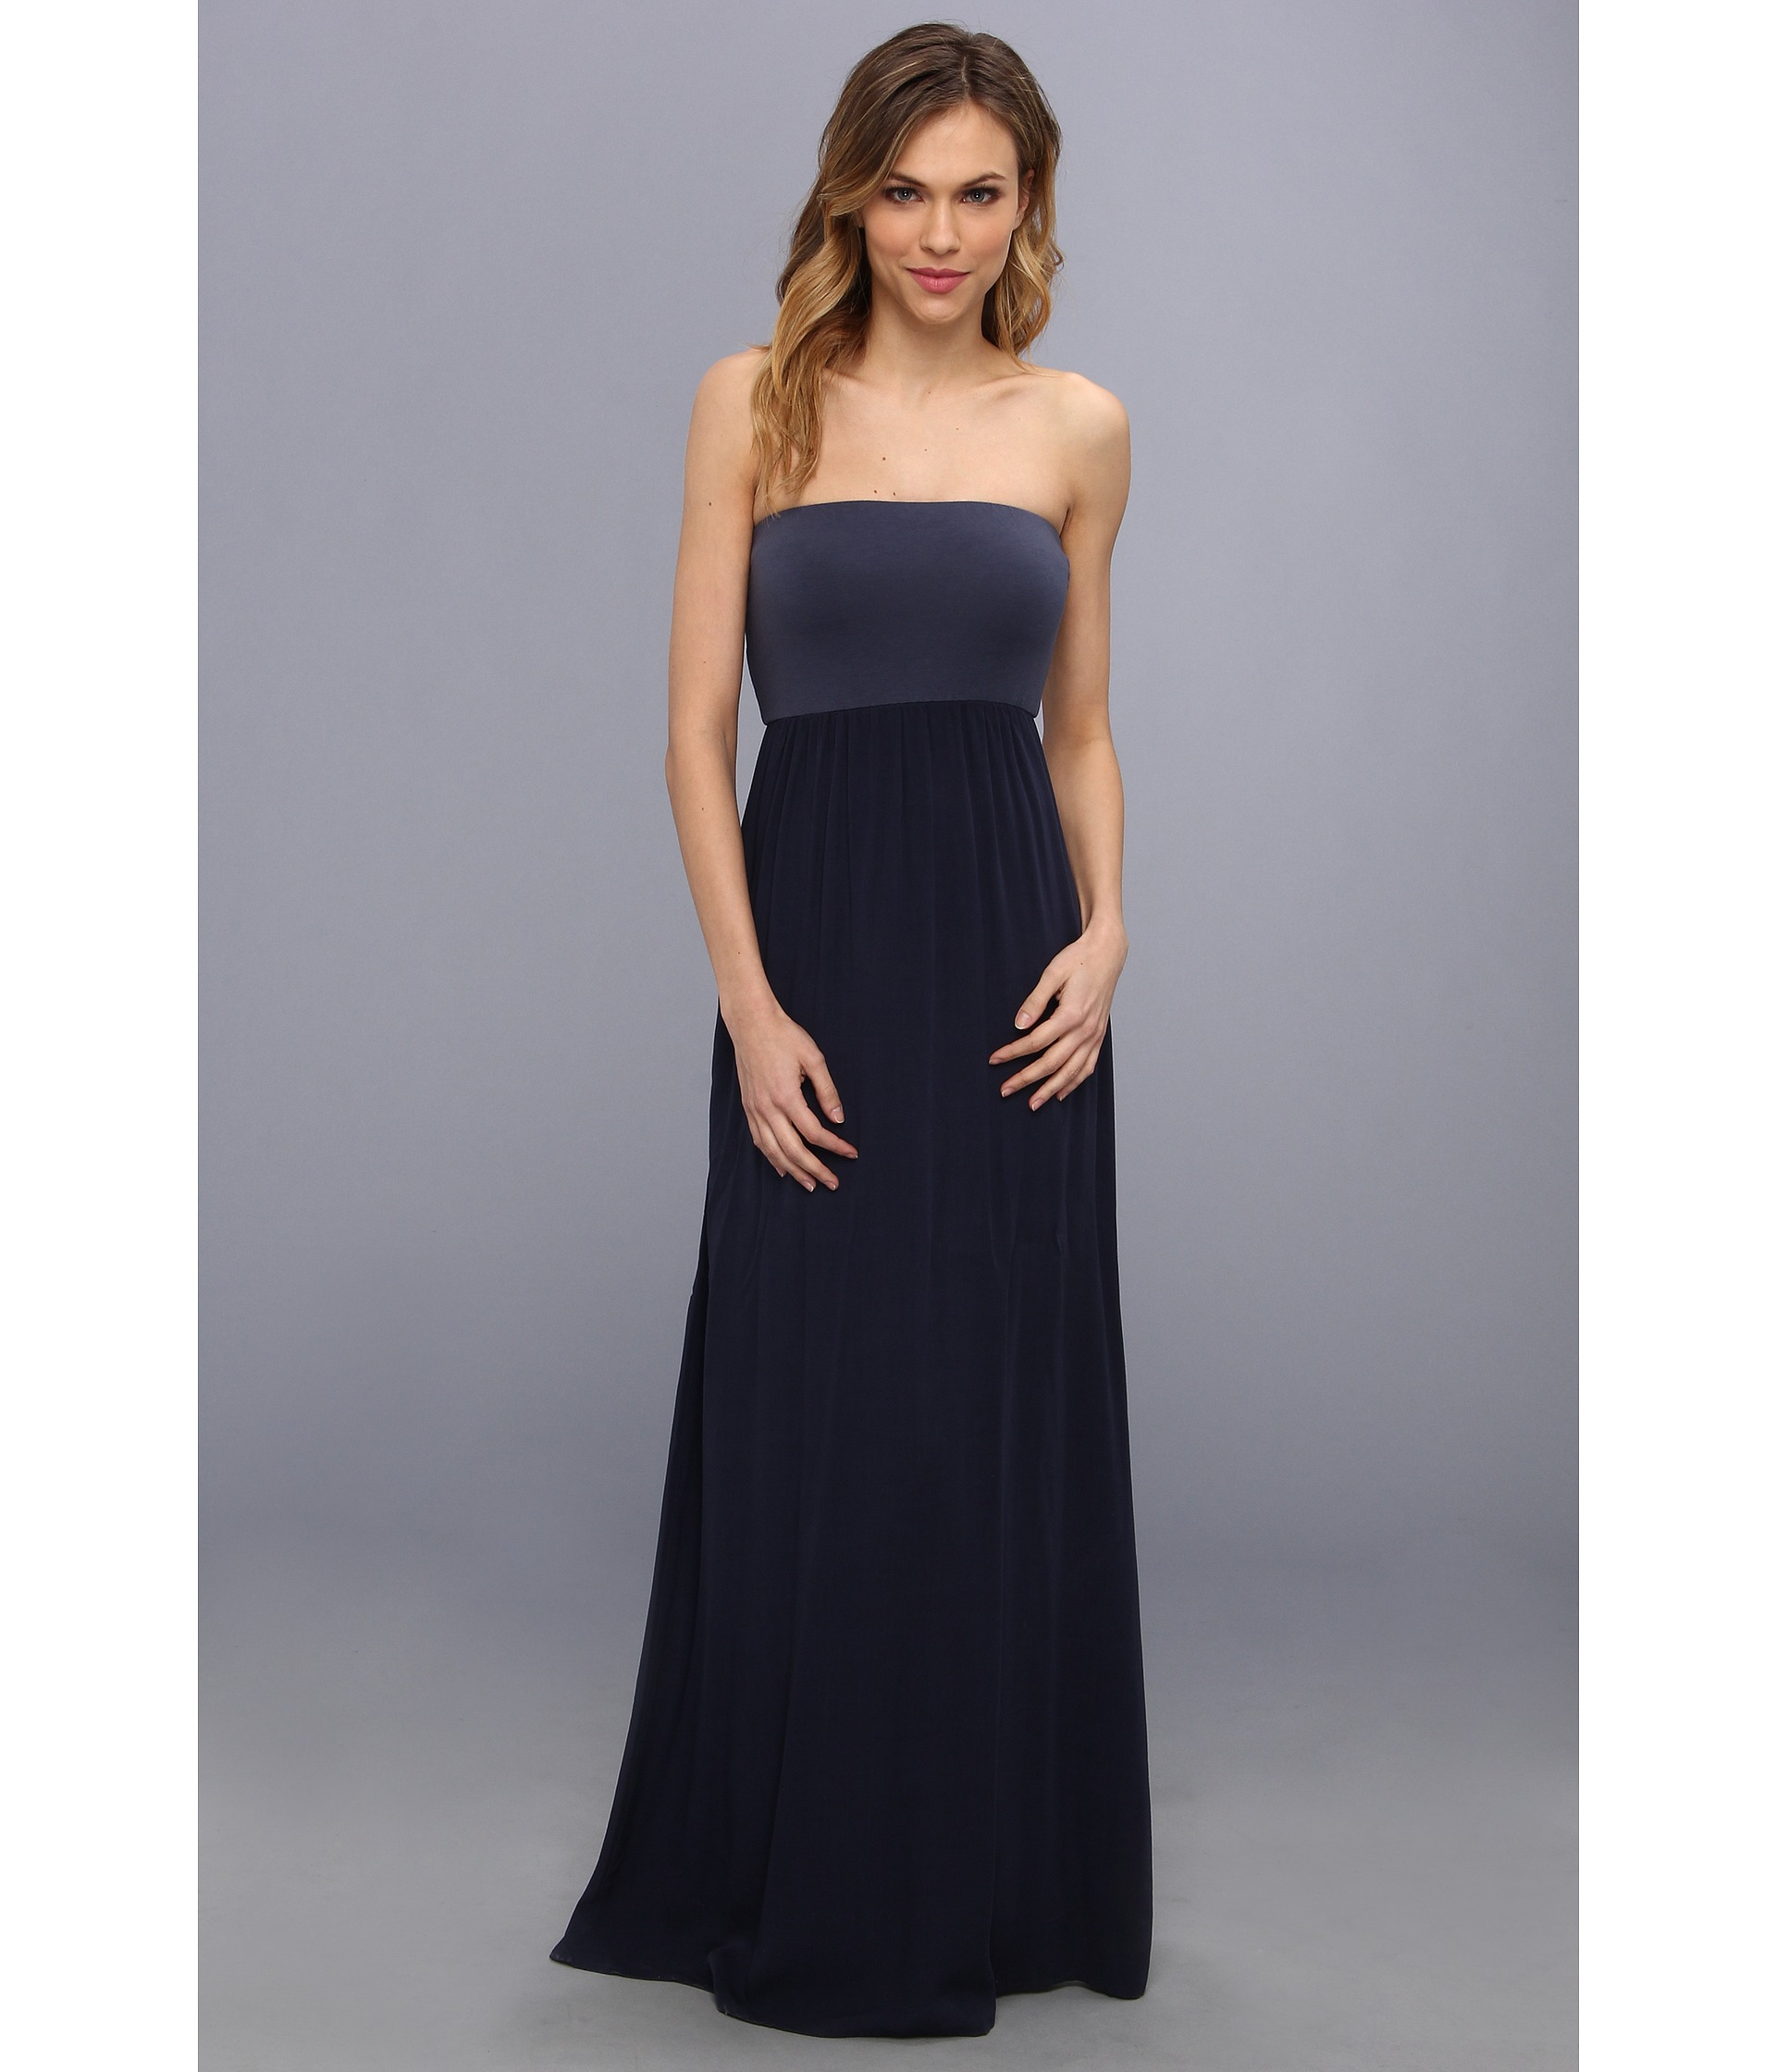 Mini Dress Tube Top in Blue Floral | KokoNorth |Blue Tube Top Dress